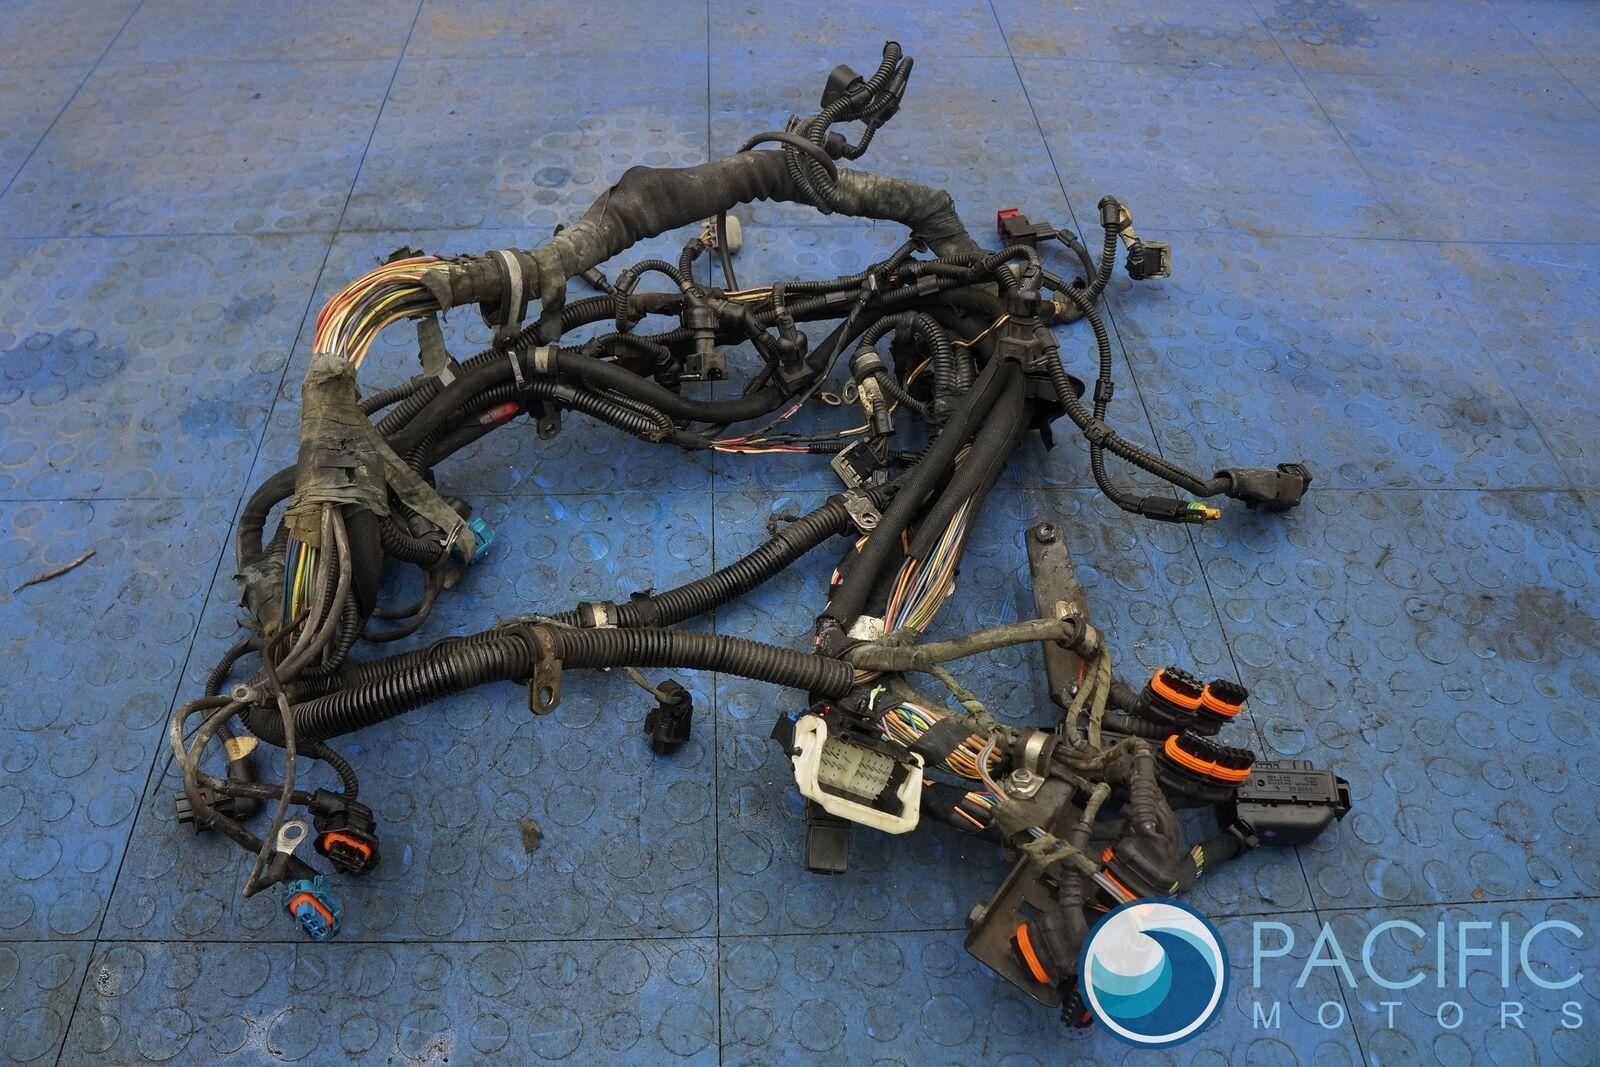 Engine Wiring Wire Harness 42l V8 F136 190041 Maserati 4200 M138